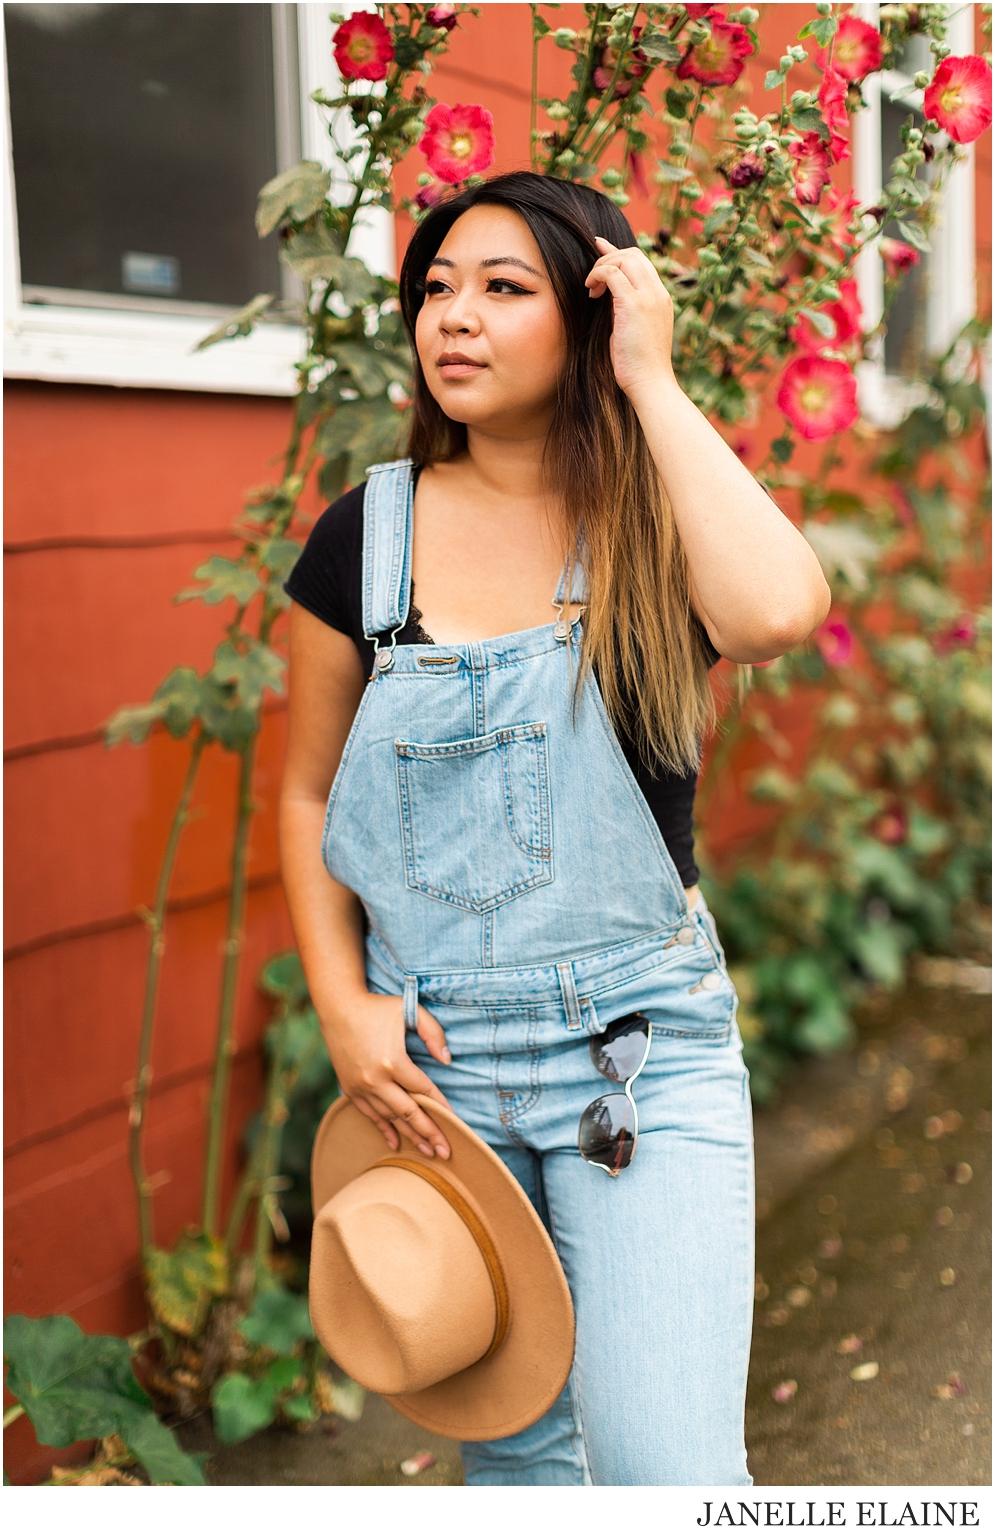 Aiko-Seattle WA-lifestyle photoshoot-Renton-Janelle Elaine Photography-9.jpg